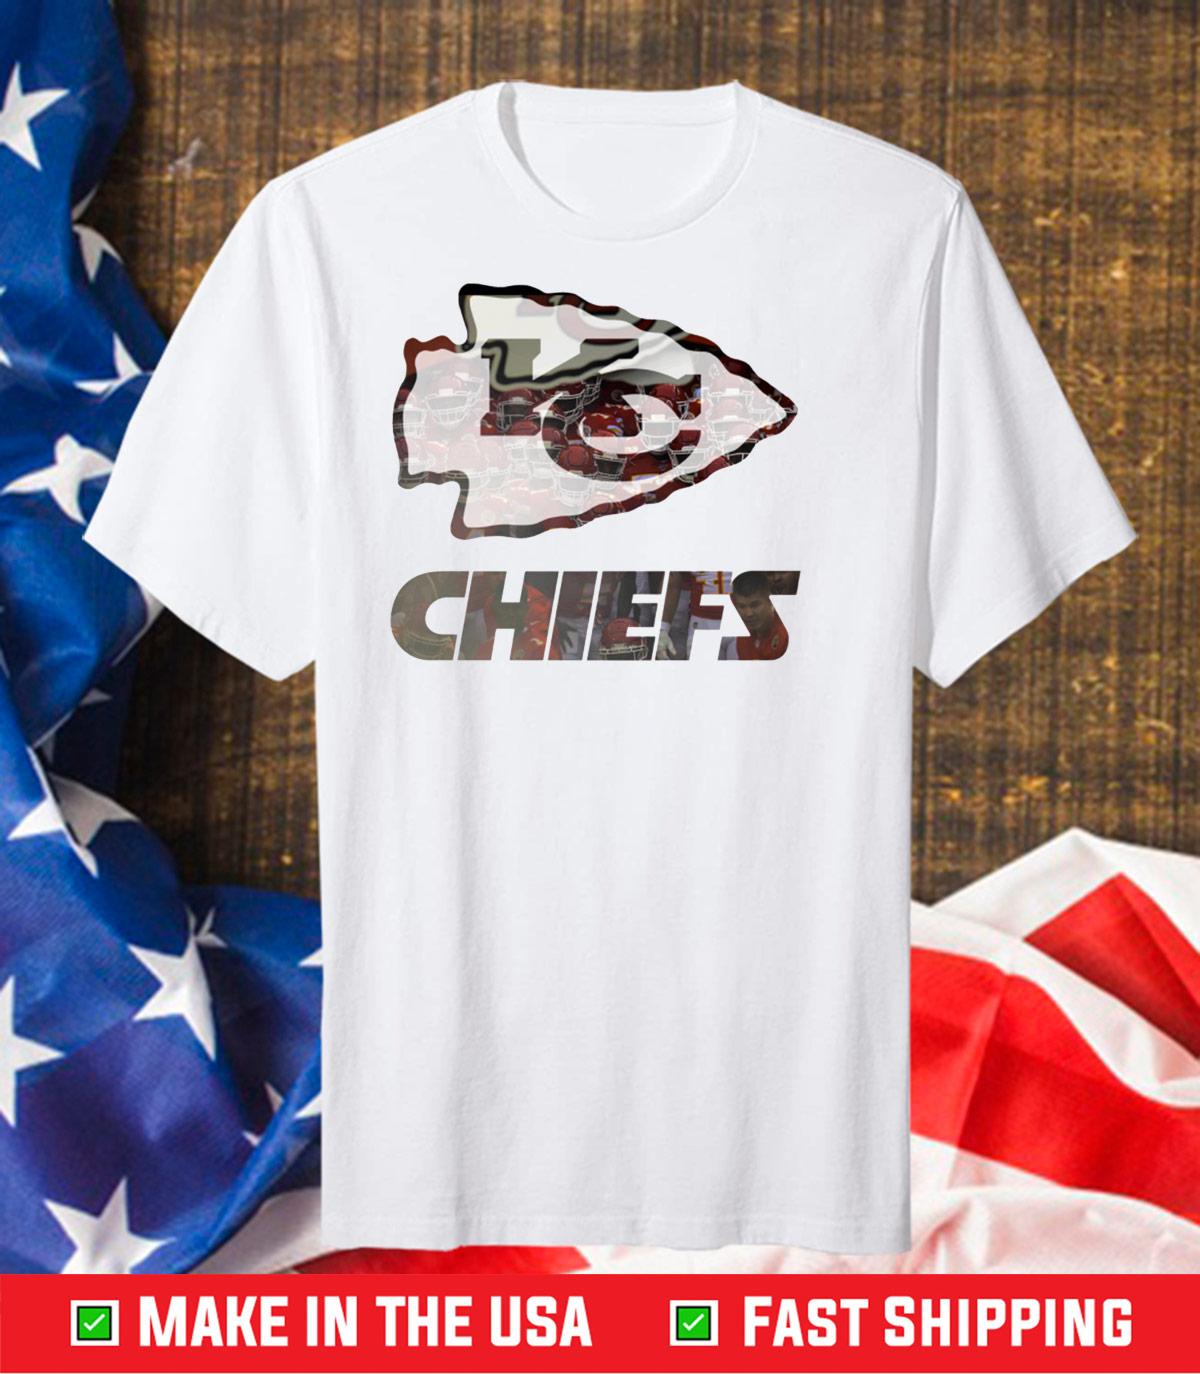 Kansas City Chiefs Team,NFL Championship Classic T-Shirts